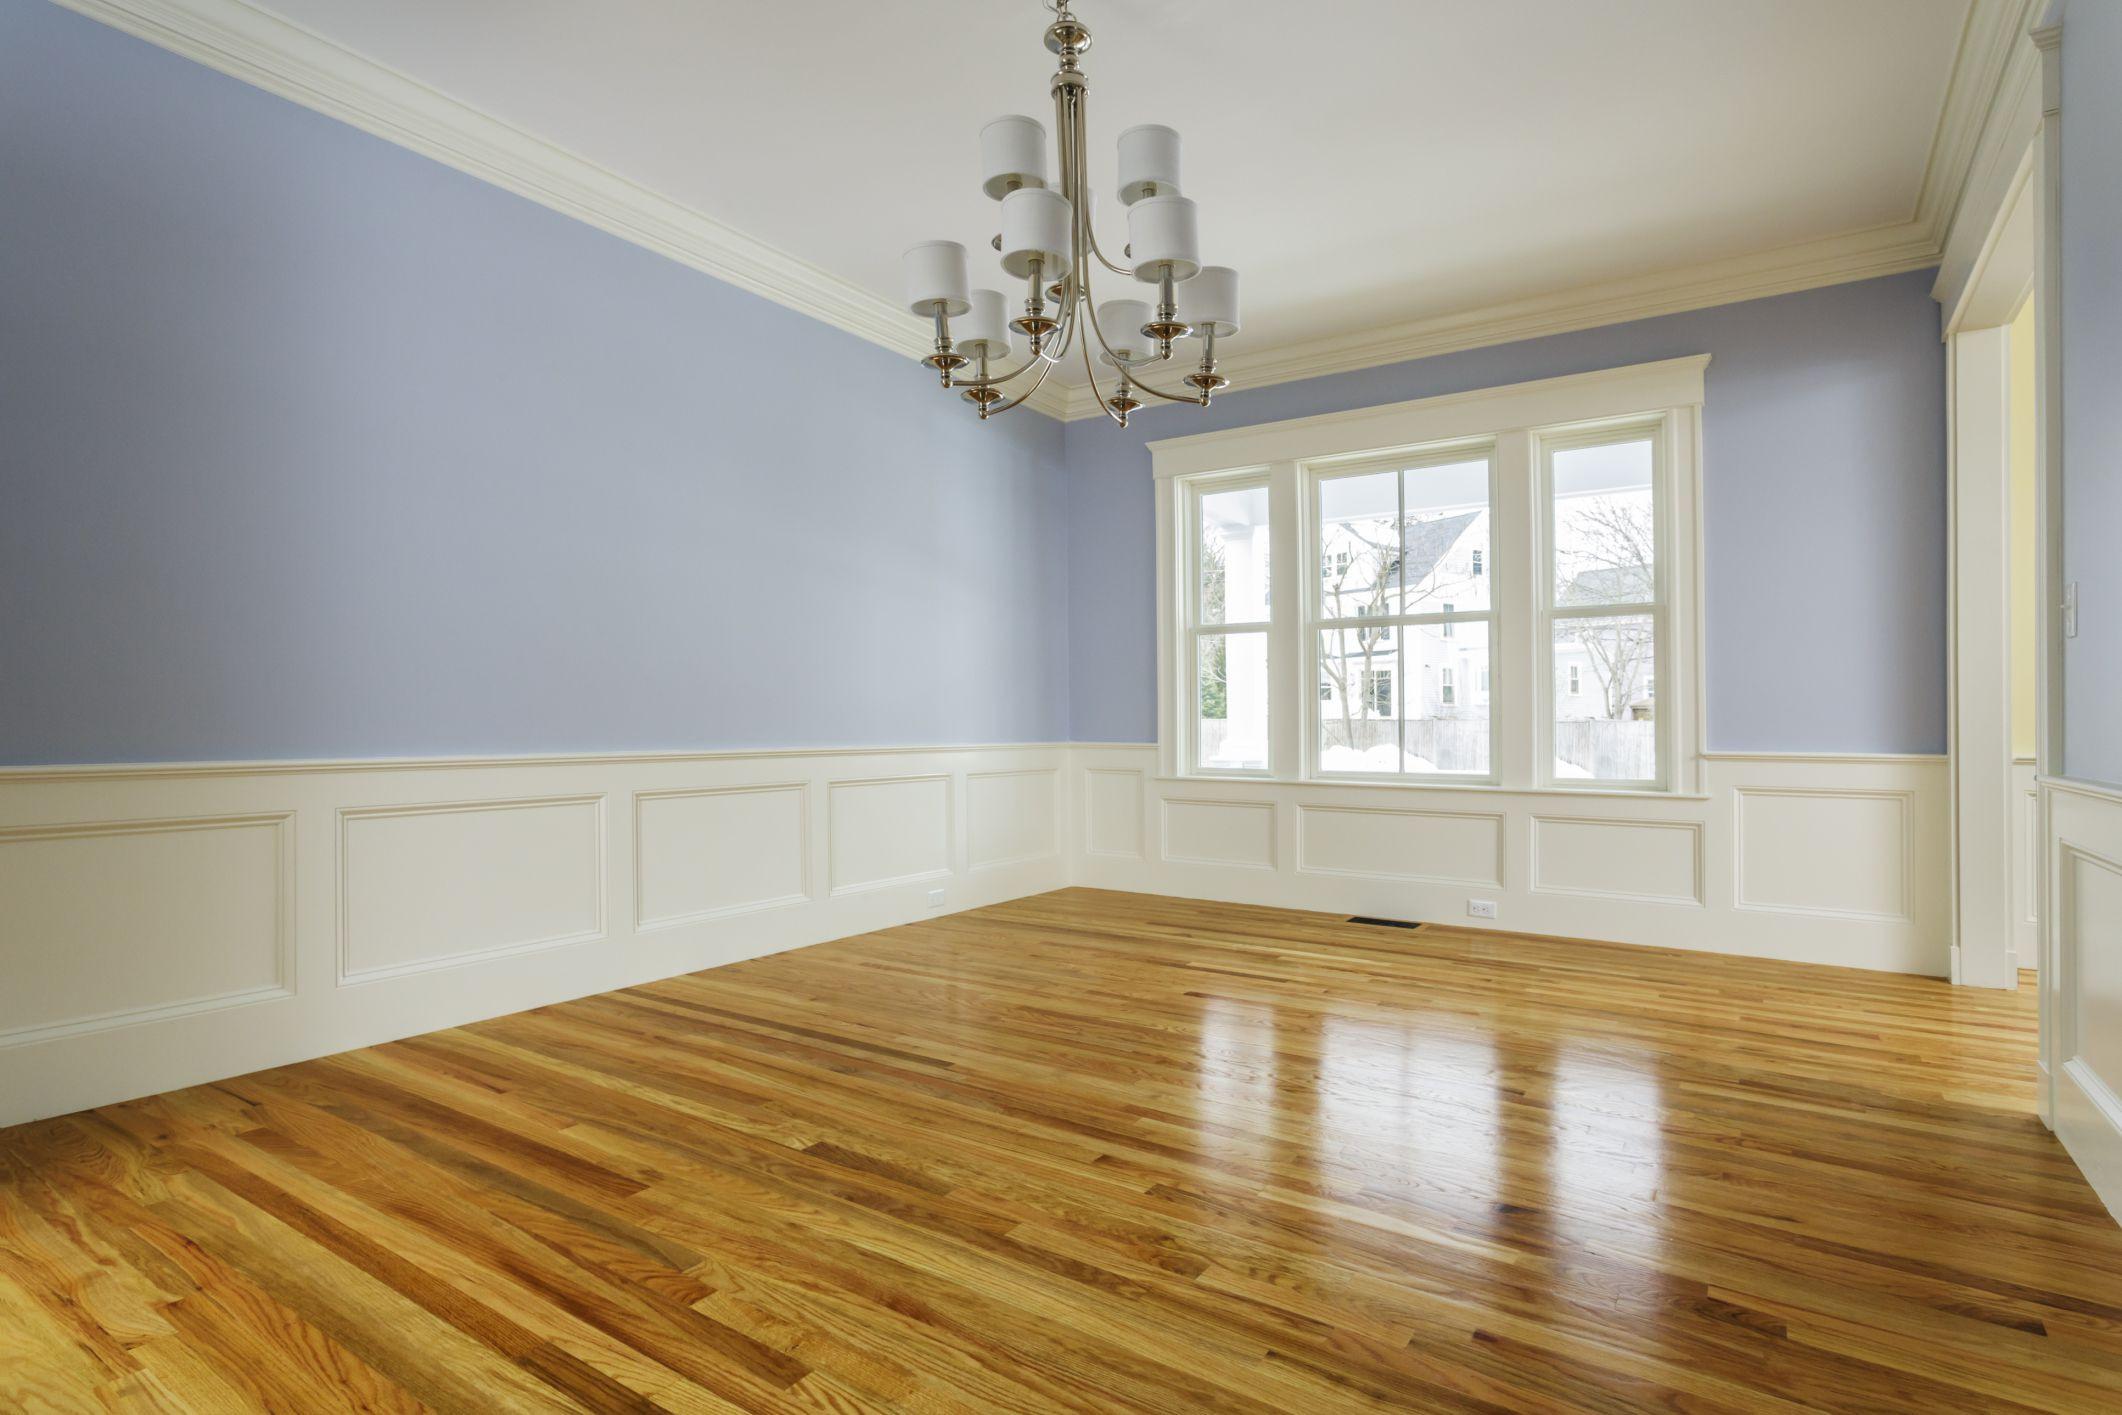 21 Elegant Hardwood Floor Refinishing tool Rental 2021 free download hardwood floor refinishing tool rental of the cost to refinish hardwood floors intended for 168686572 highres 56a2fd773df78cf7727b6cb3